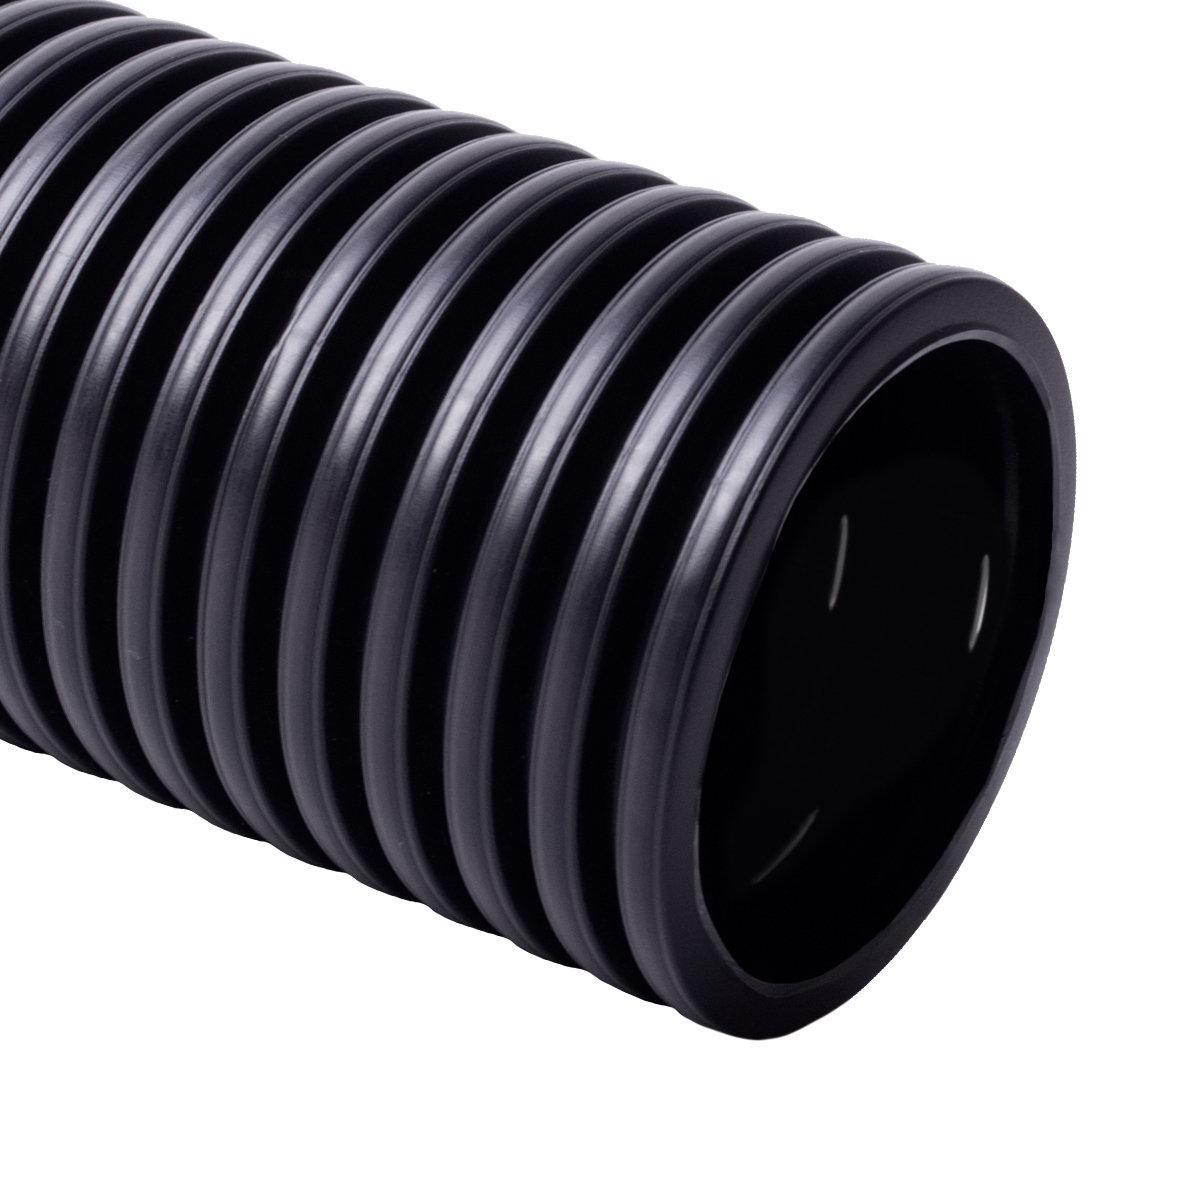 Труба дренажна 80 мм, чорна; одношарова; поліетилен; бухта  50 м